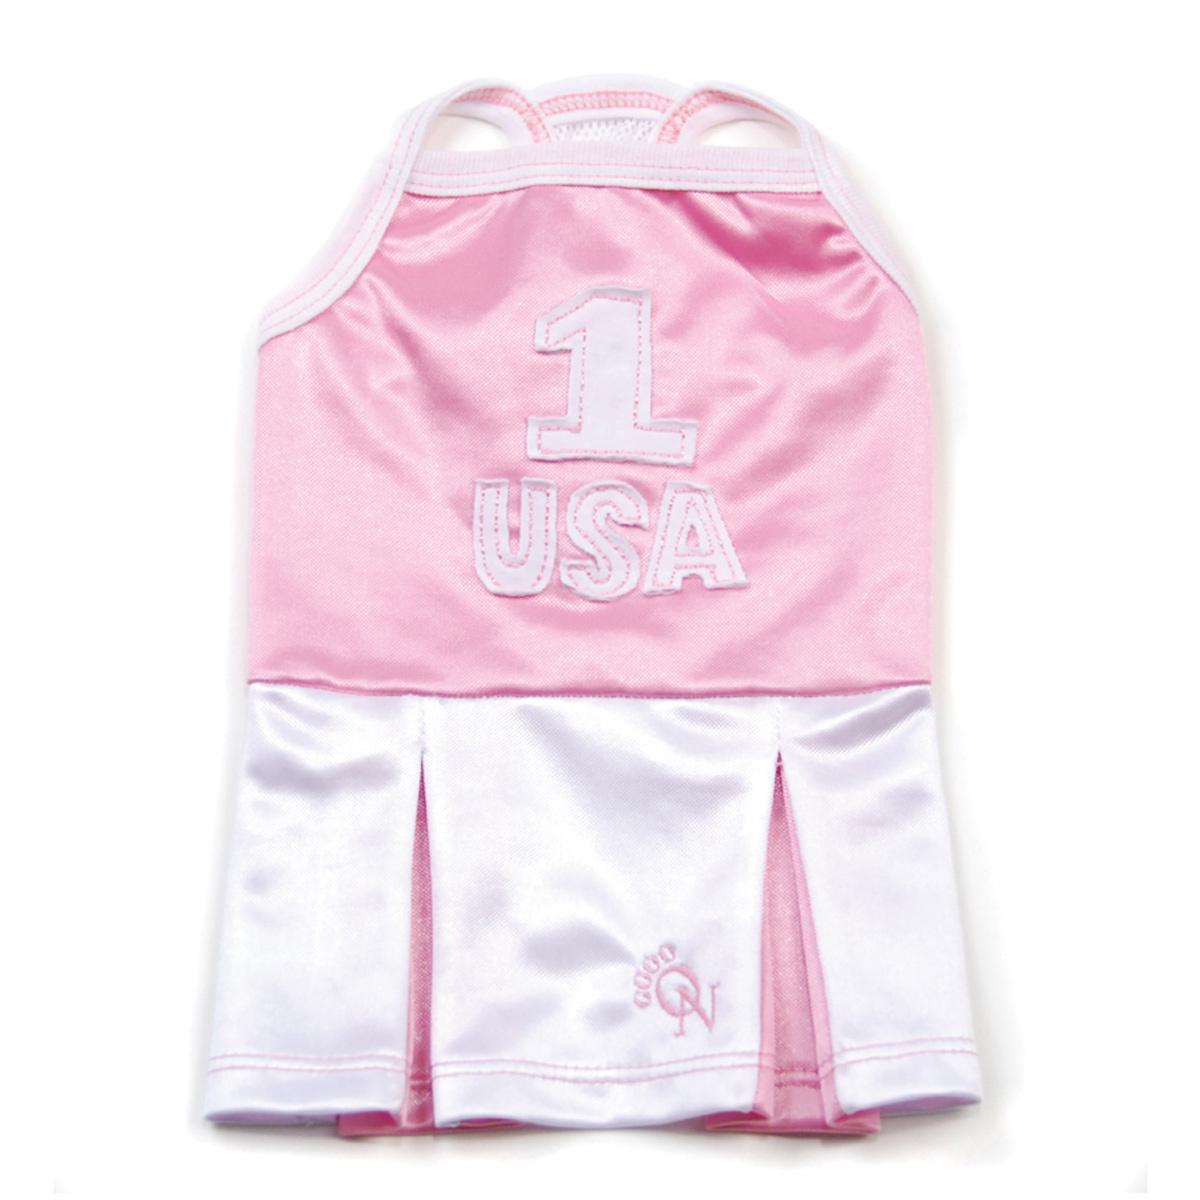 USA Sporty Chic Tank Dog Dress by Oscar Newman - Pink